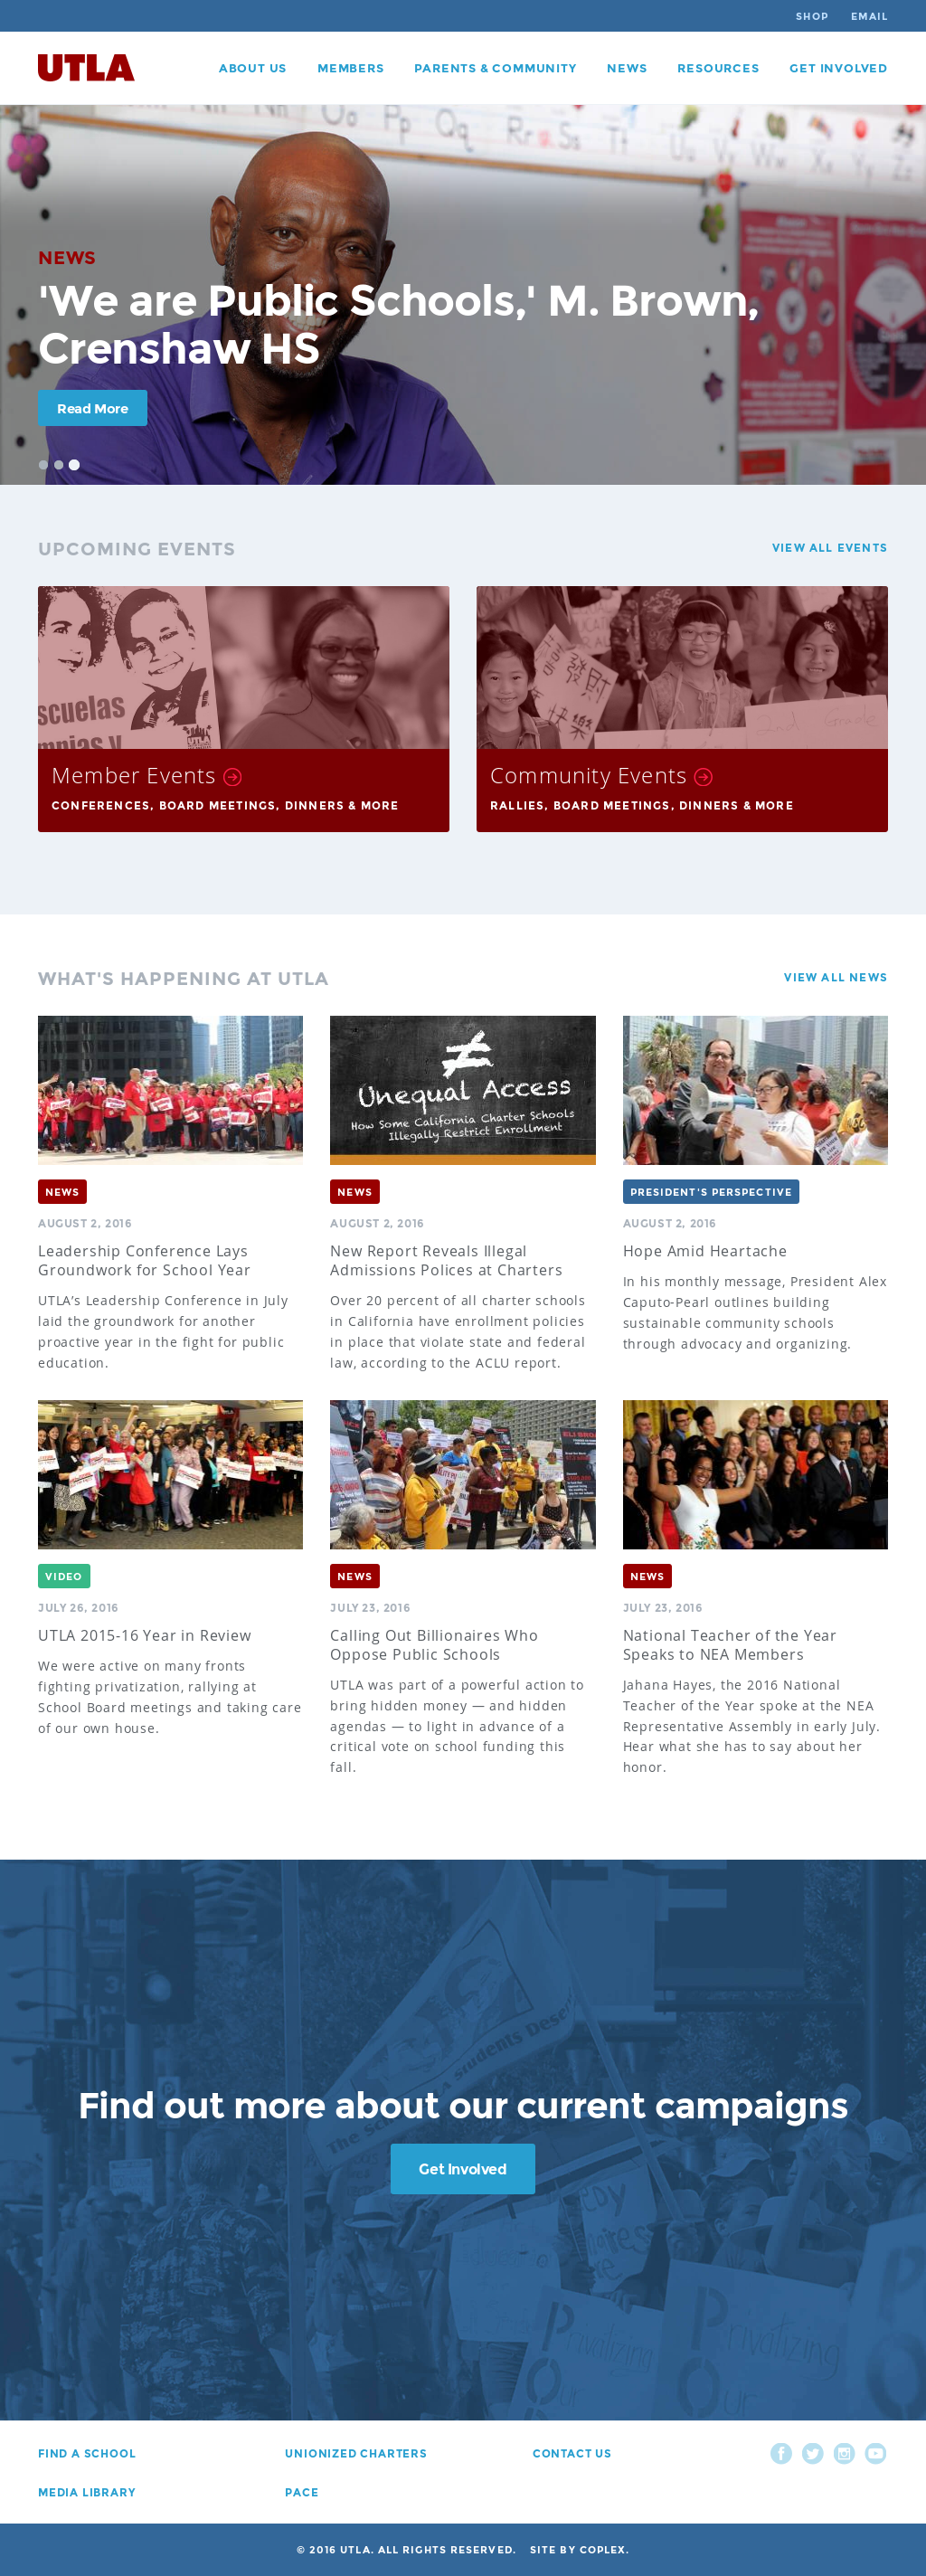 Utla Competitors, Revenue and Employees - Owler Company Profile